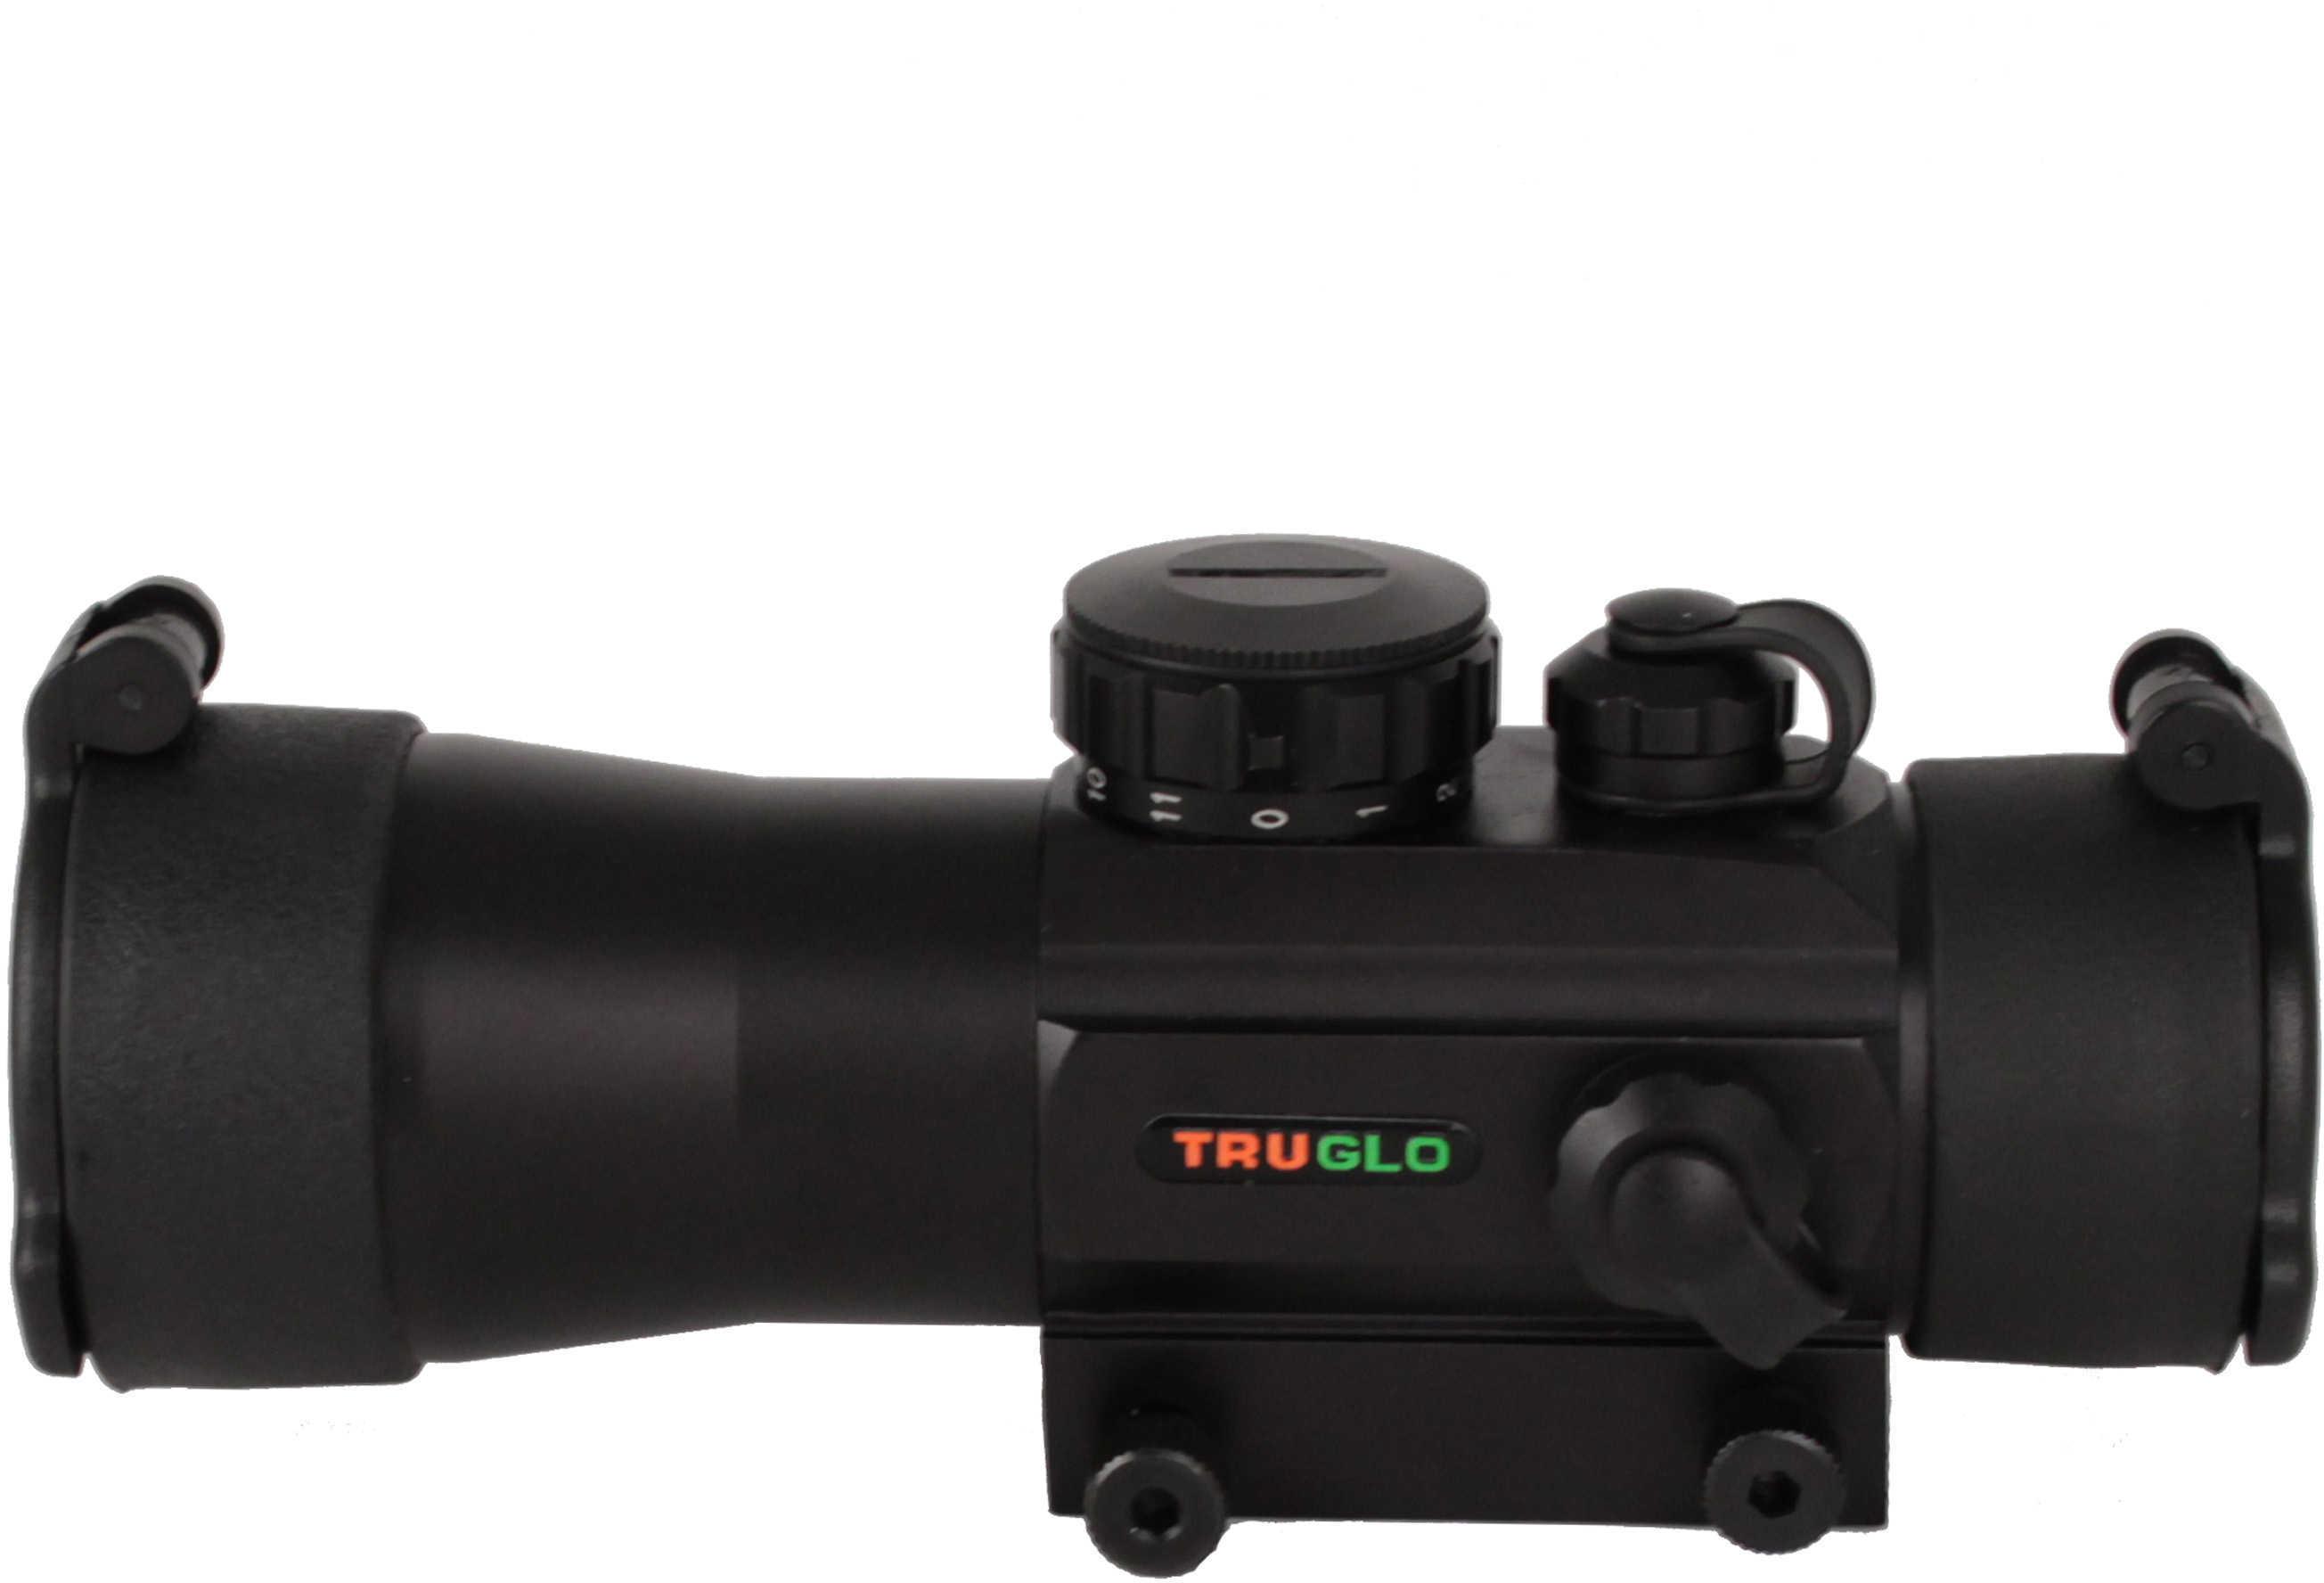 Truglo XtRM Red Dot Scope 2X42mm 30mm 5MOA 1x CR2032 Battery Black Finish TG8030B2